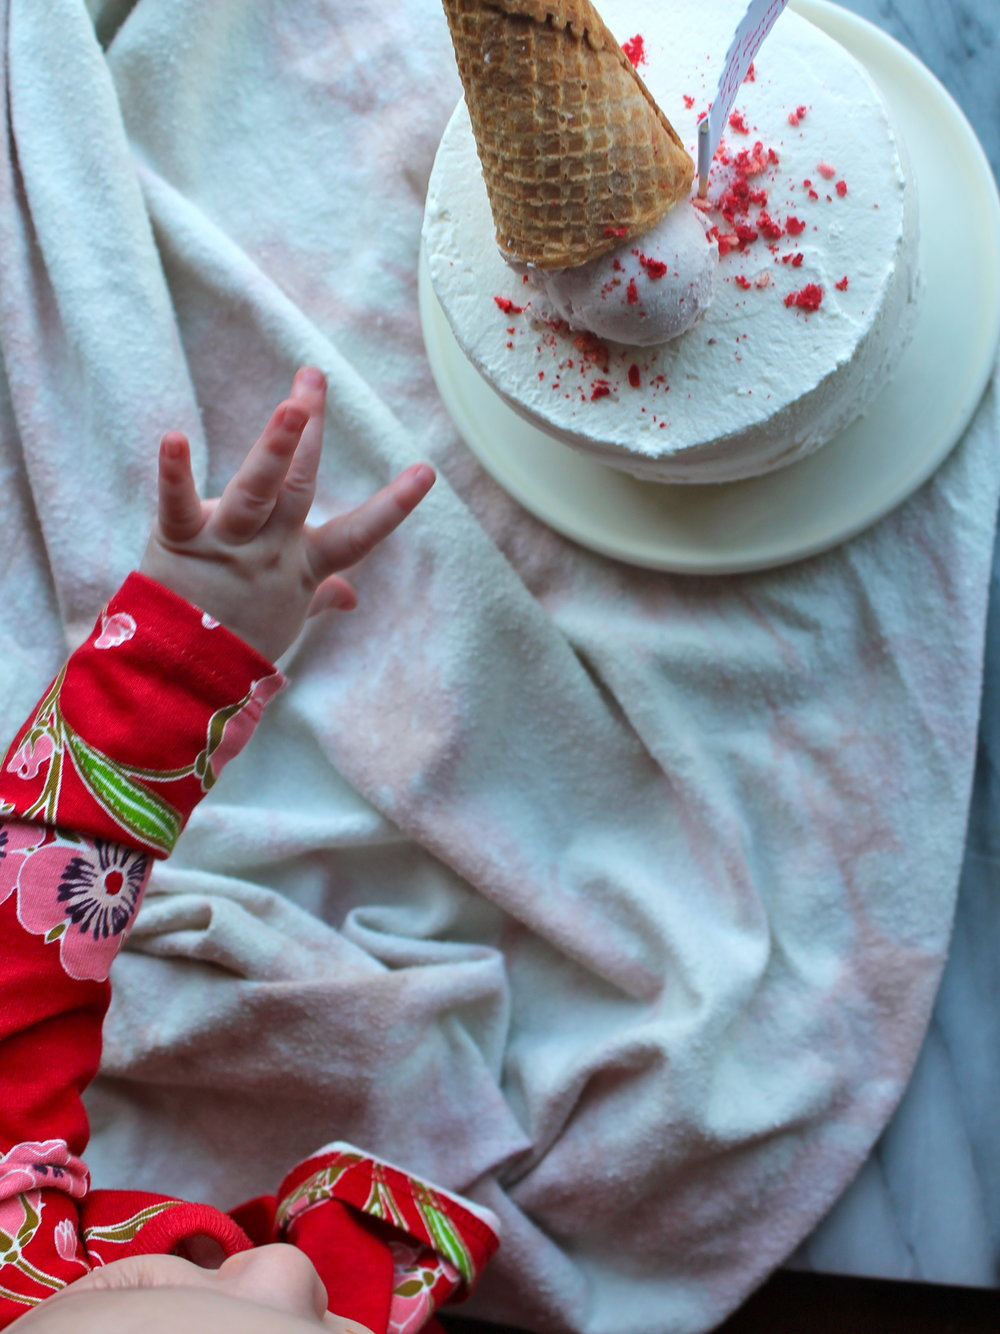 neapolitan ice cream cake for children's birthday party